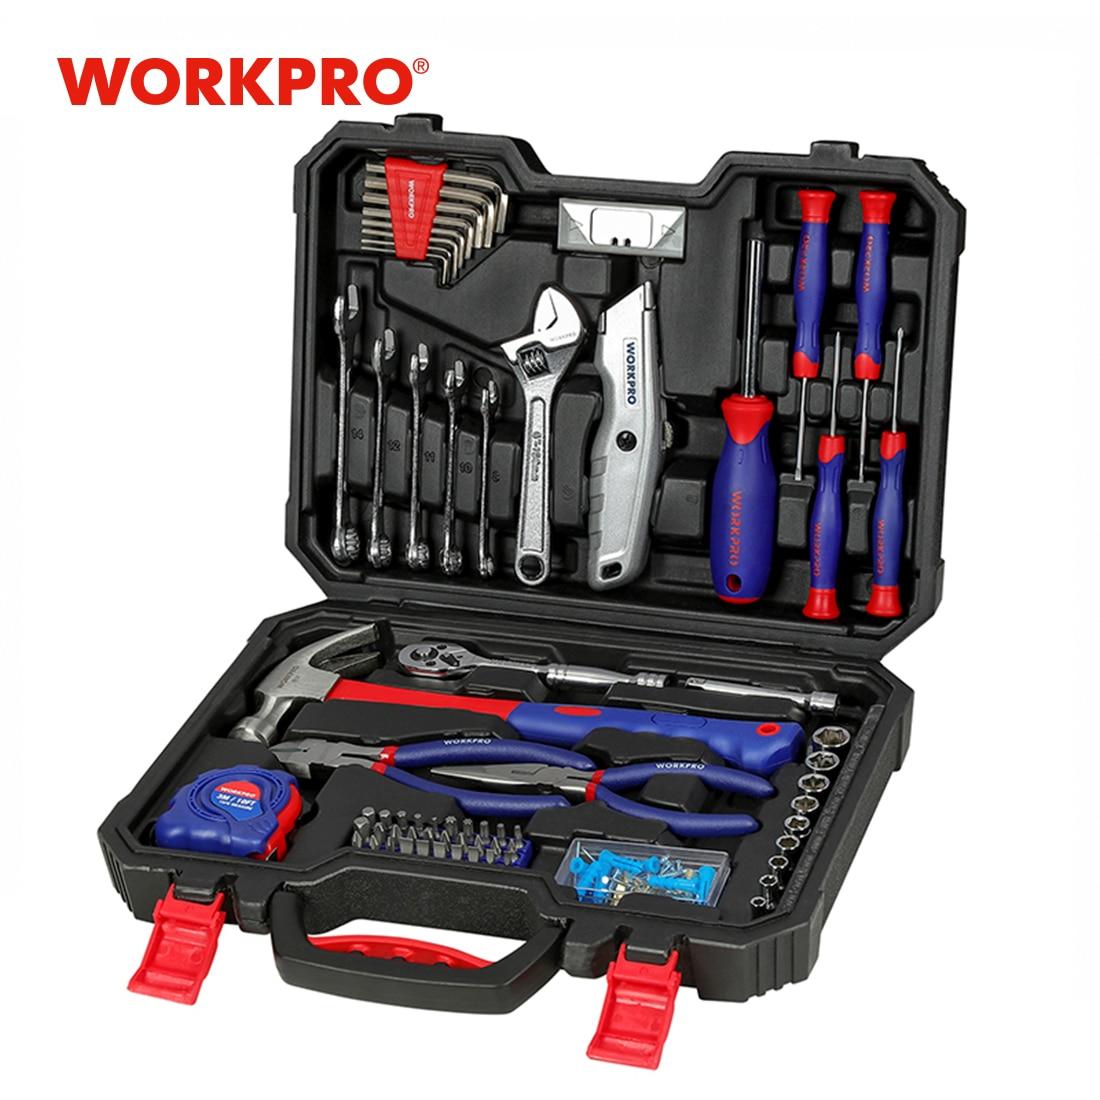 WORKPRO-مجموعة أدوات منزلية ، أدوات يدوية للاستخدام اليومي ، مجموعة أدوات منزلية ، مفك براغي ، مفتاح ربط ، كماشة سكين ، 160 قطعة